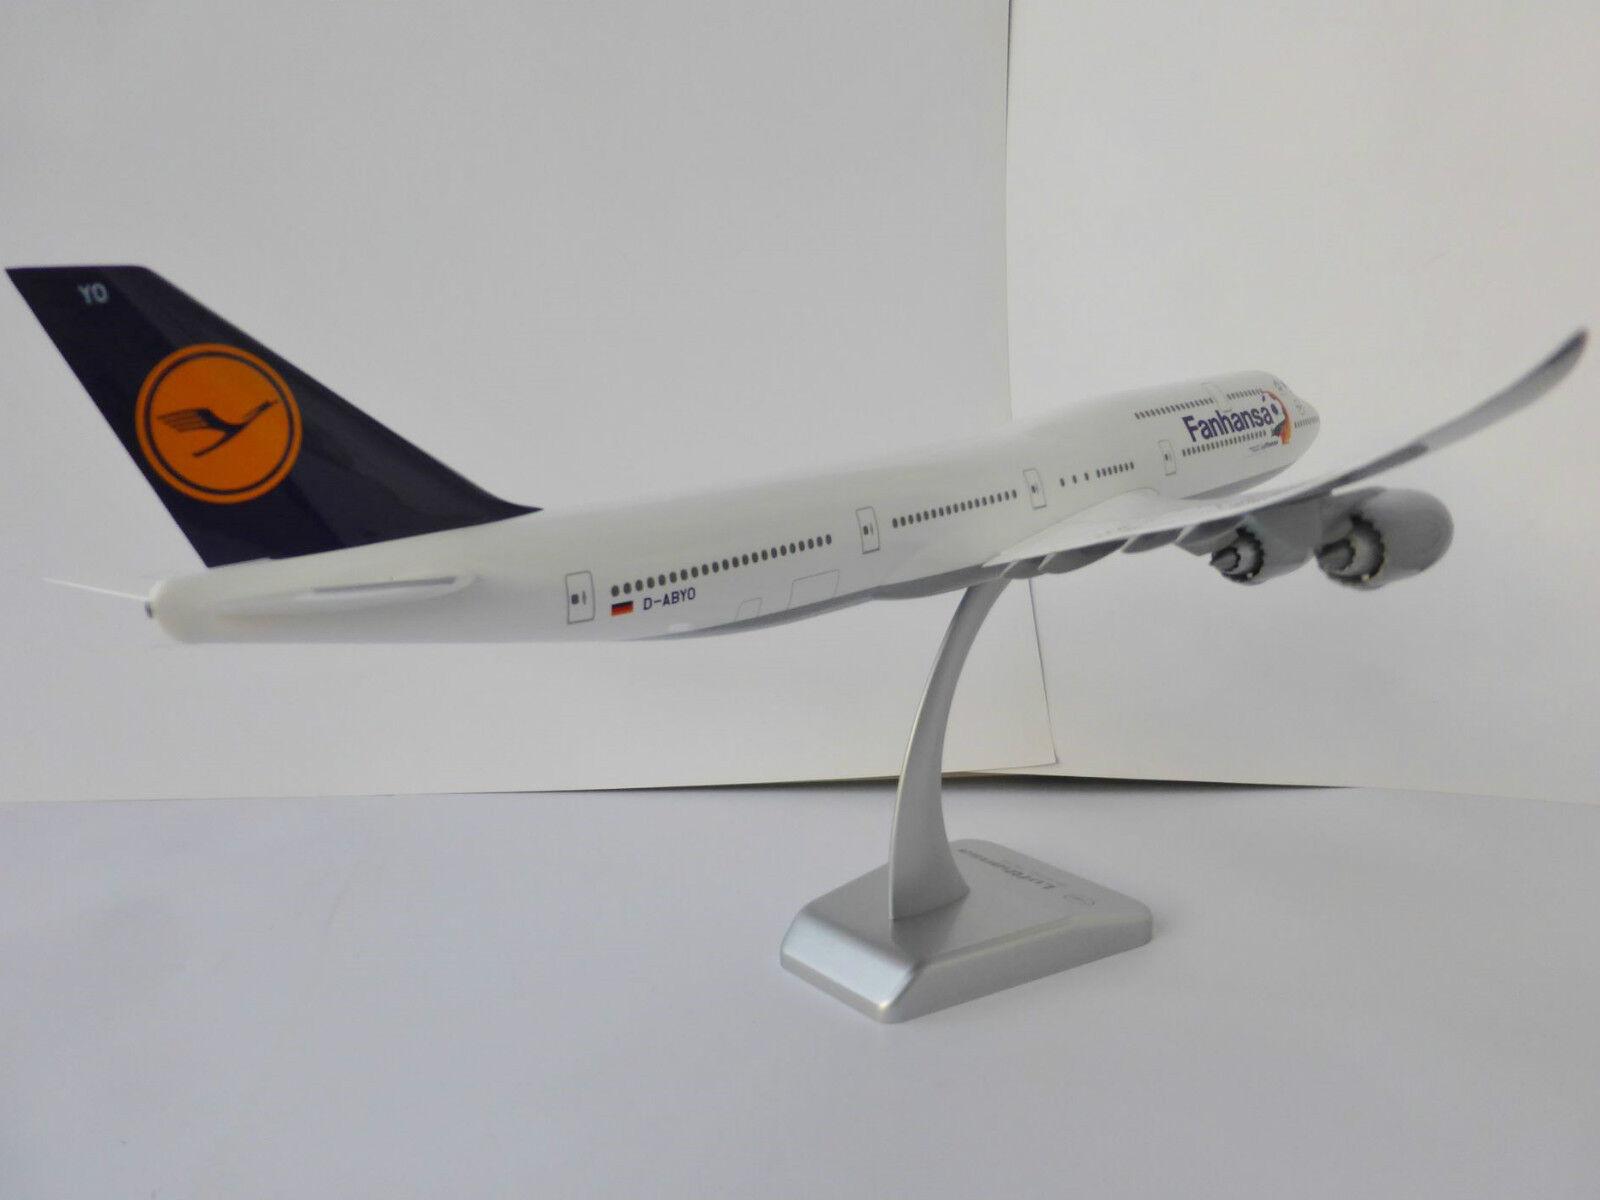 FANHANSA Boeing 747-8 747-8 747-8 LUFTHANSA 1 200 Limox Wings LH30 747 D-ABYO Saarland WM 42cc5e